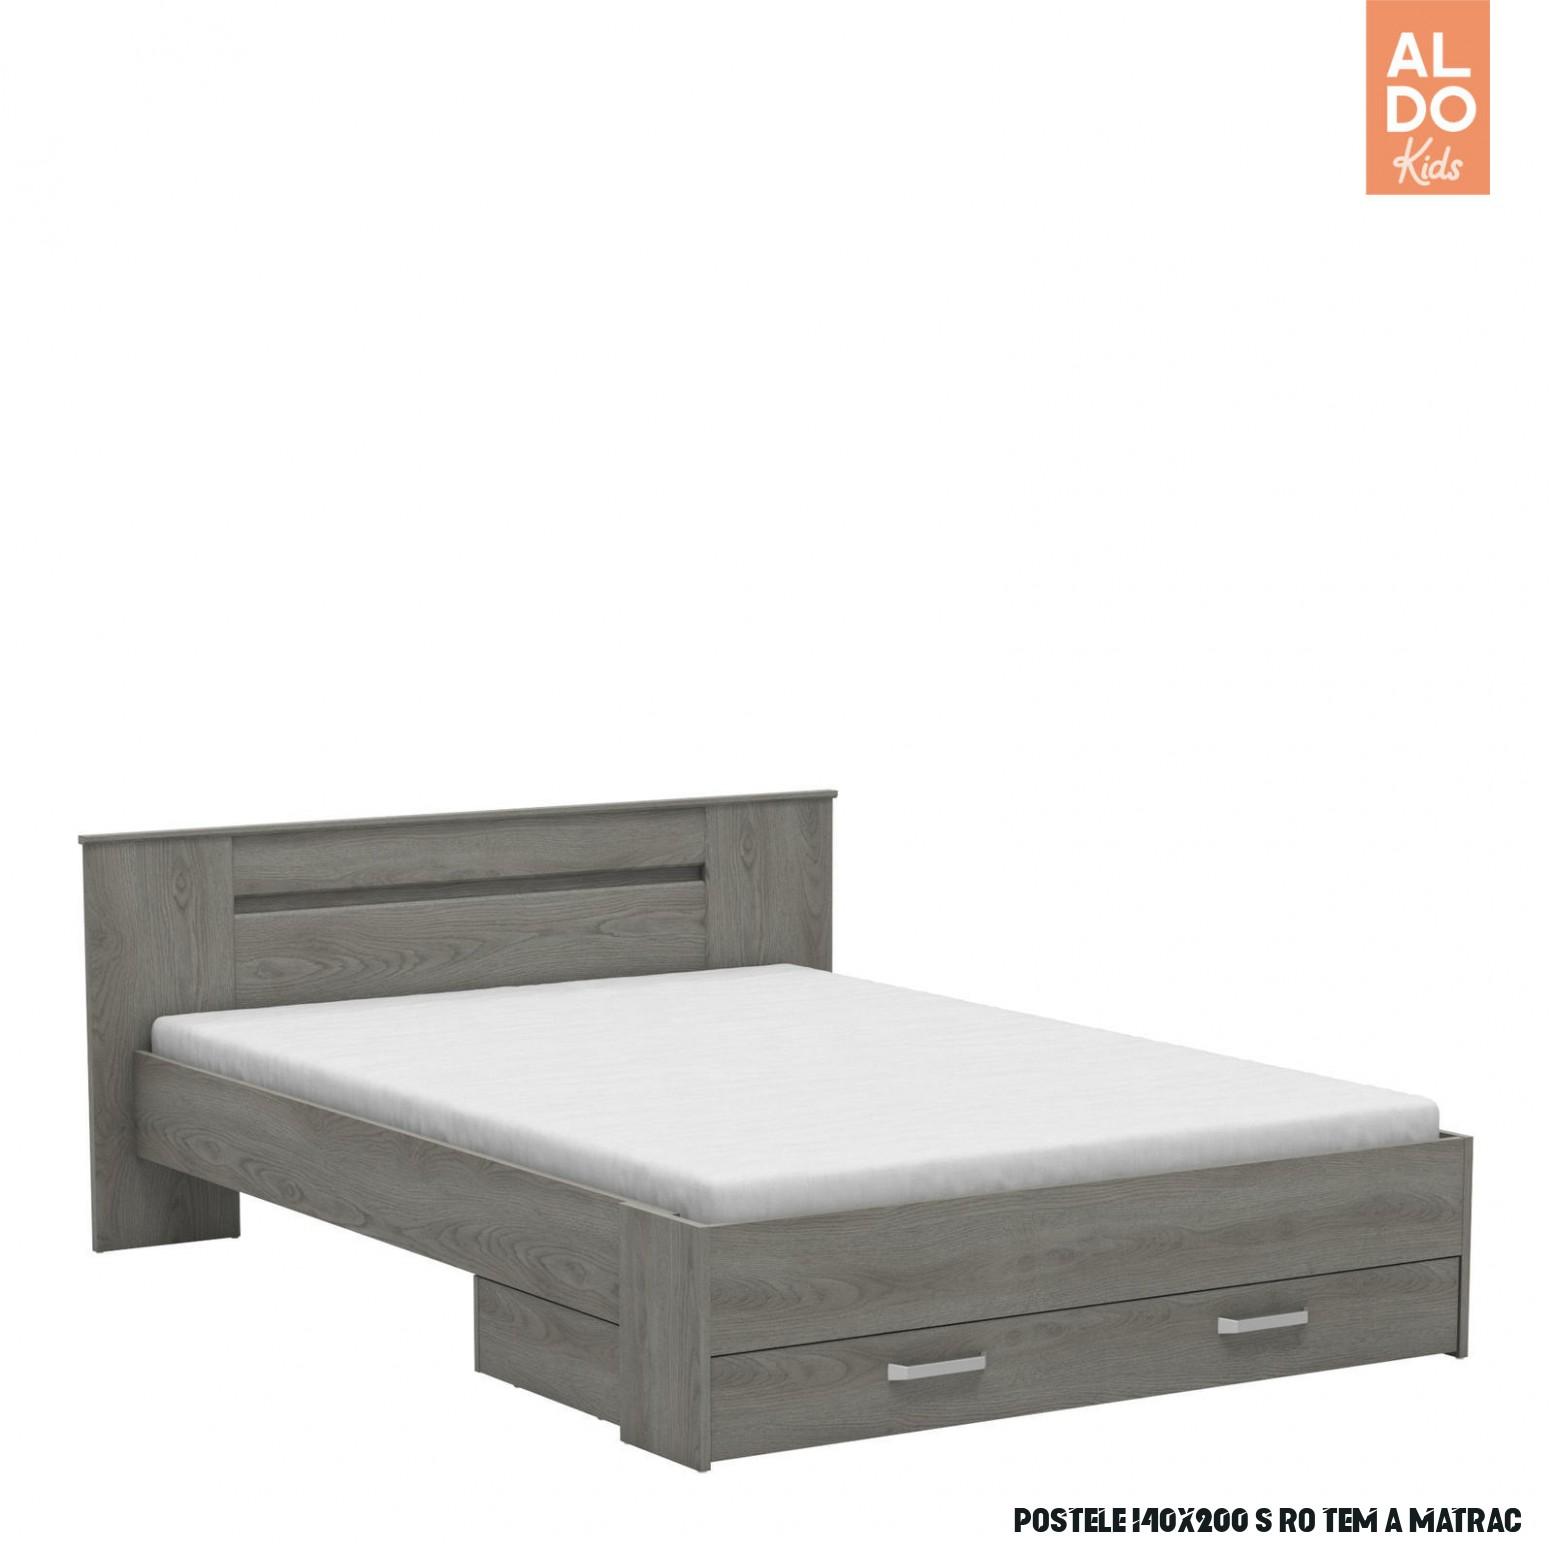 Studentská postel 19x19 s šuplíkem Divine